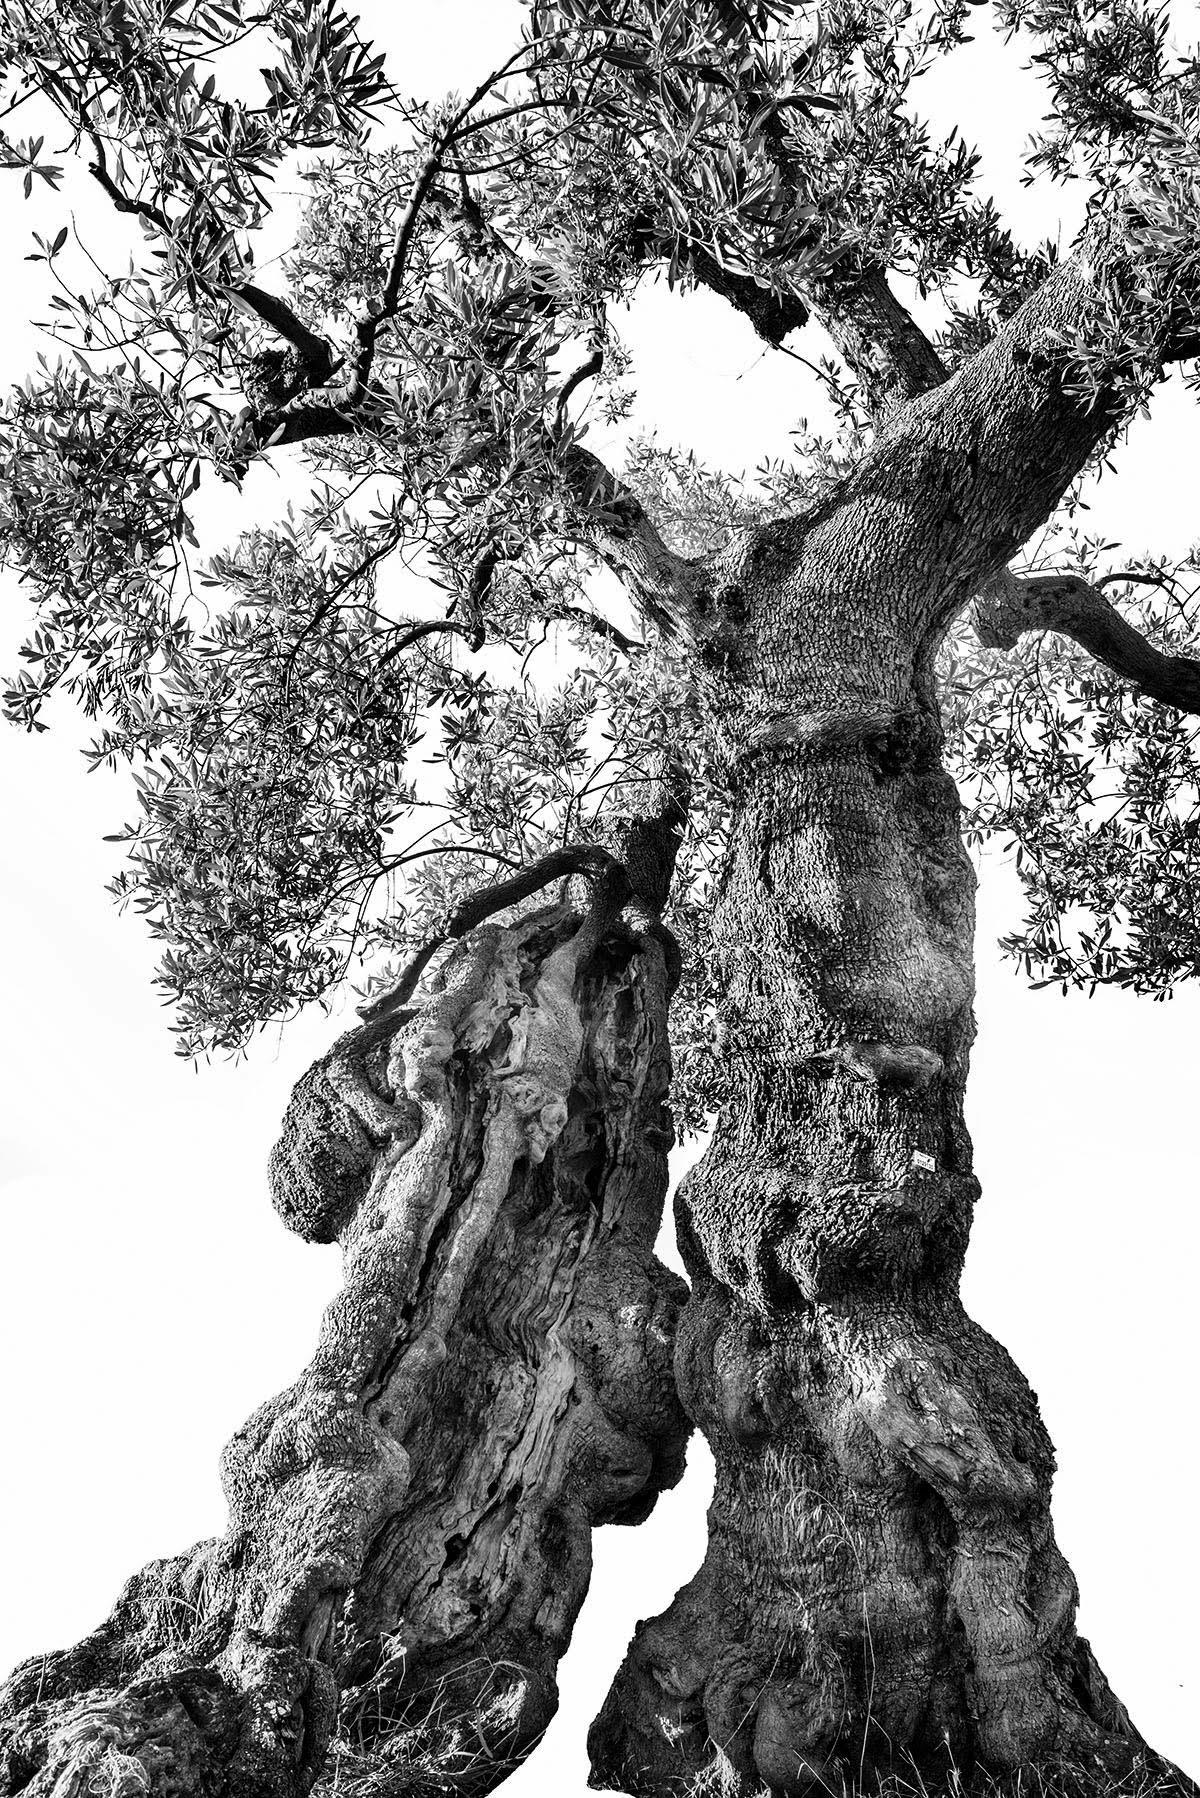 martin-ogolter-Monumentali-nature-landscape-photographer-02